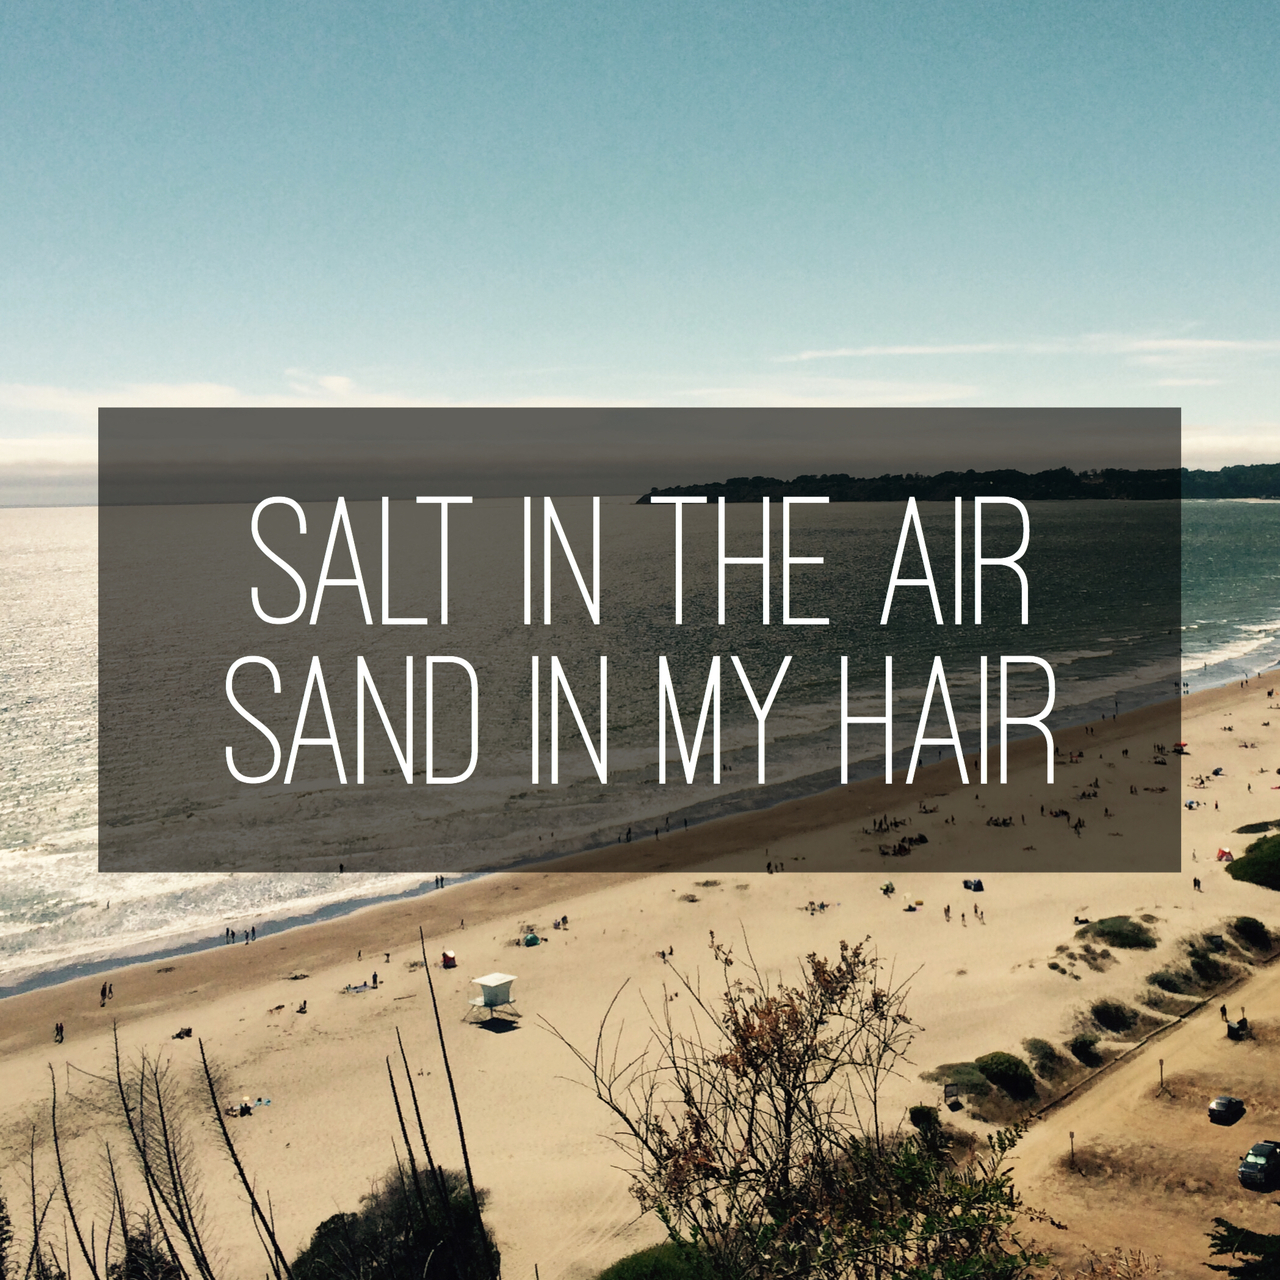 Salt in the air, sand in my hair | via @chelseapearl